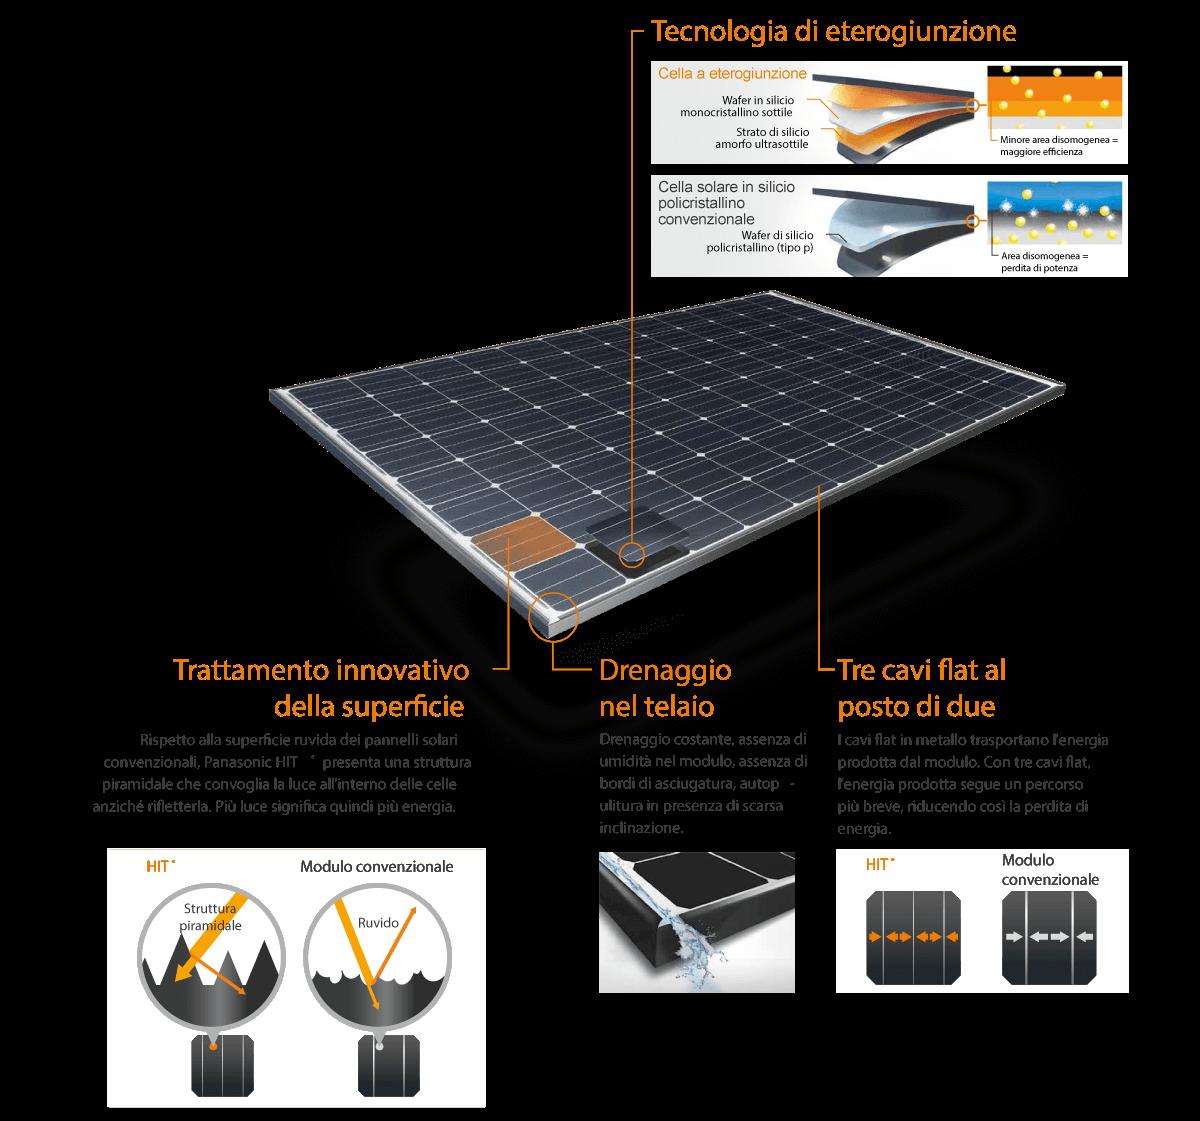 Pannelli Solari Panasonic Tecnologia HIT